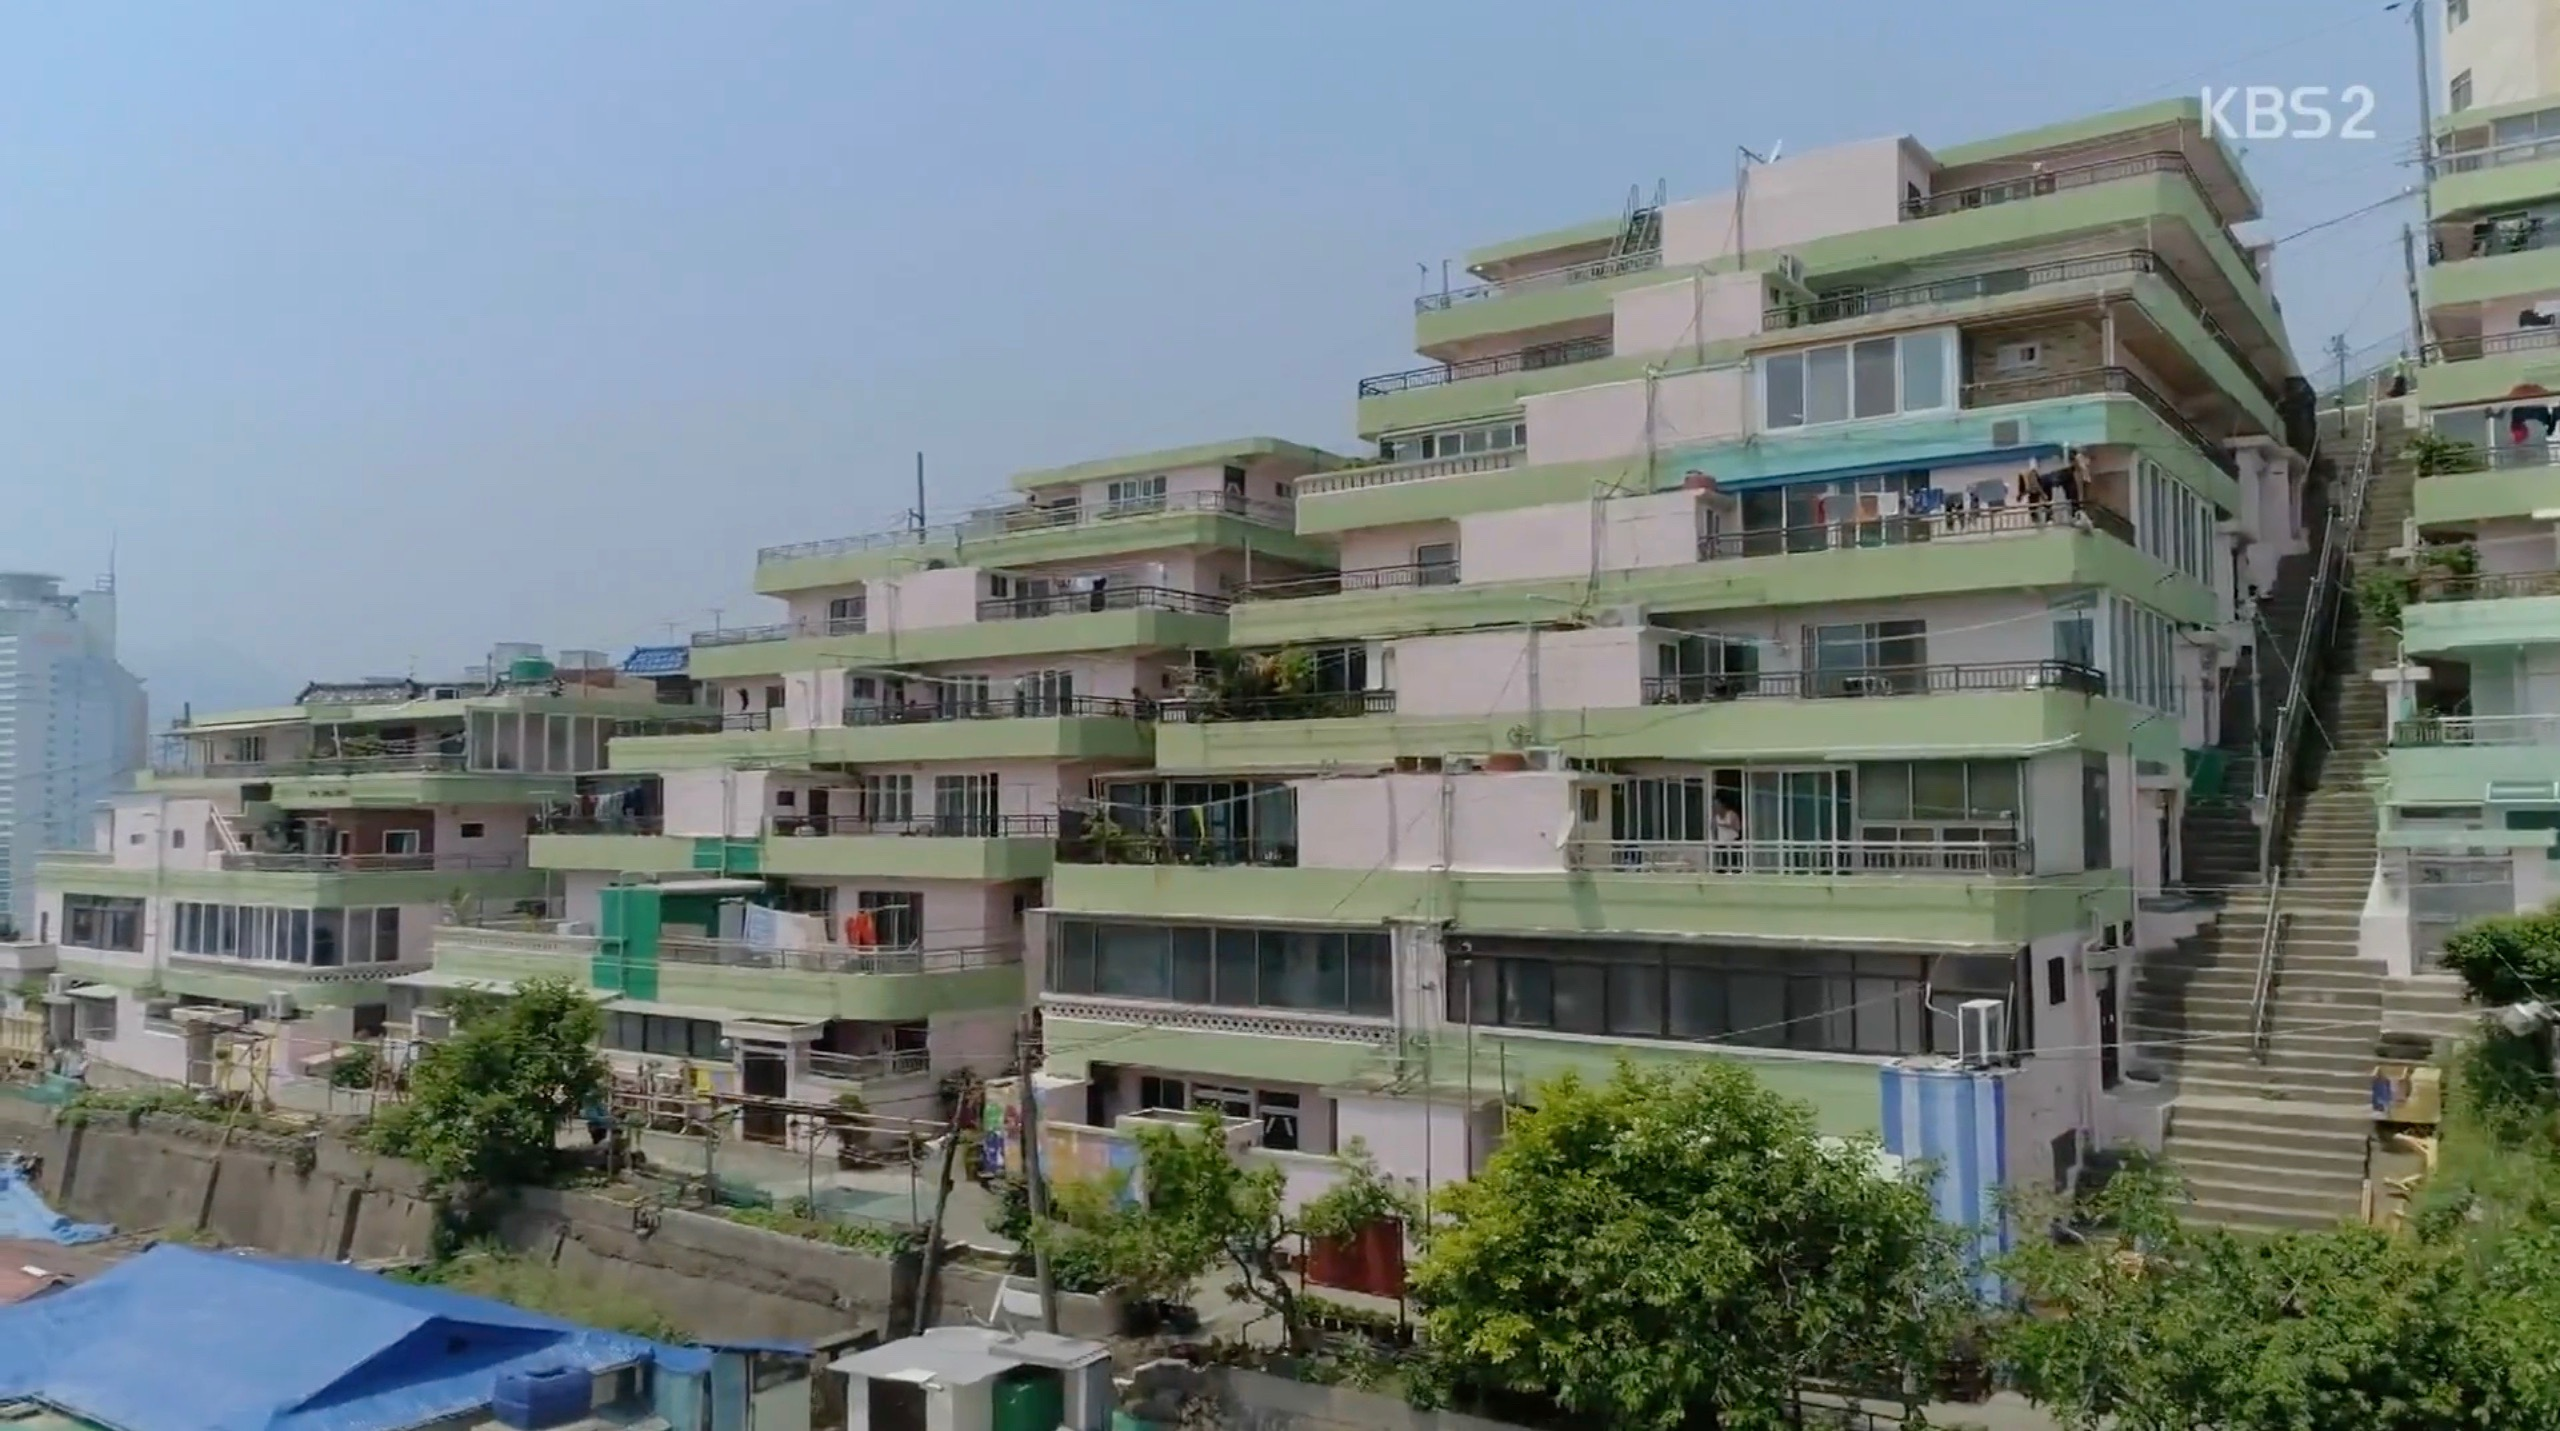 Hansung Apartment Buildings Korean Dramaland Math Wallpaper Golden Find Free HD for Desktop [pastnedes.tk]